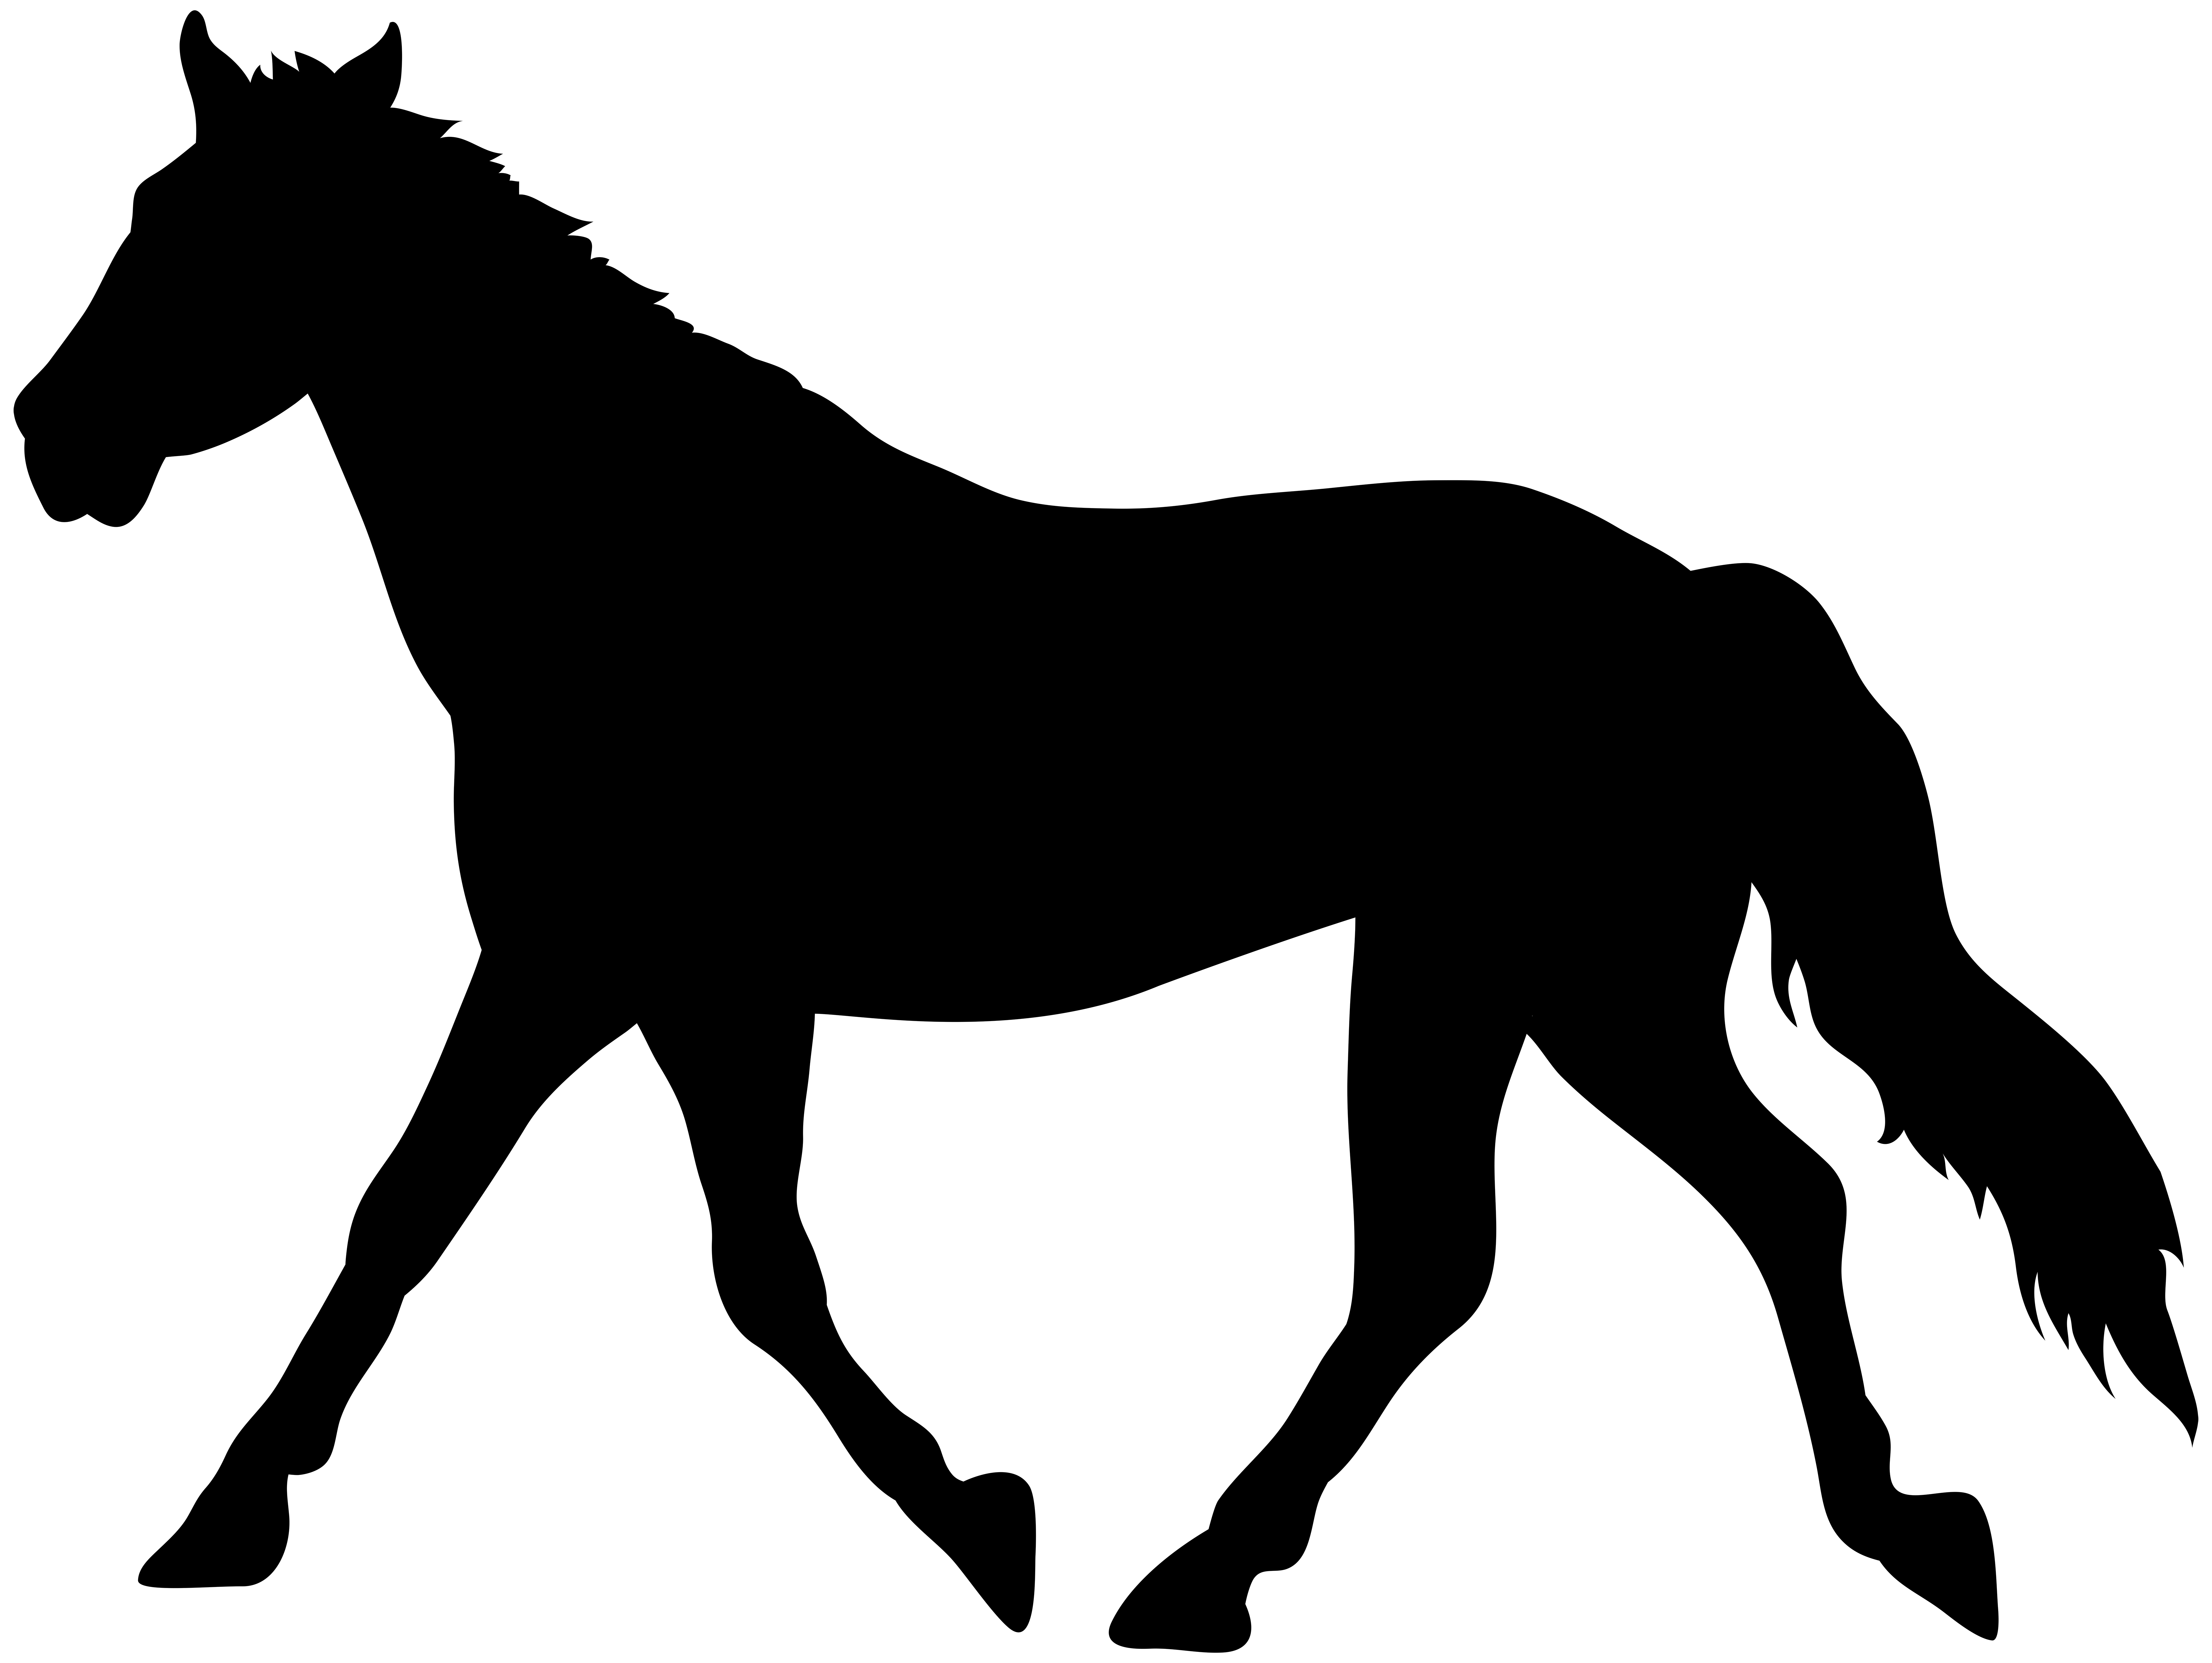 8000x6013 Horse Silhouette Png Transparent Clip Art Imageu200b Gallery